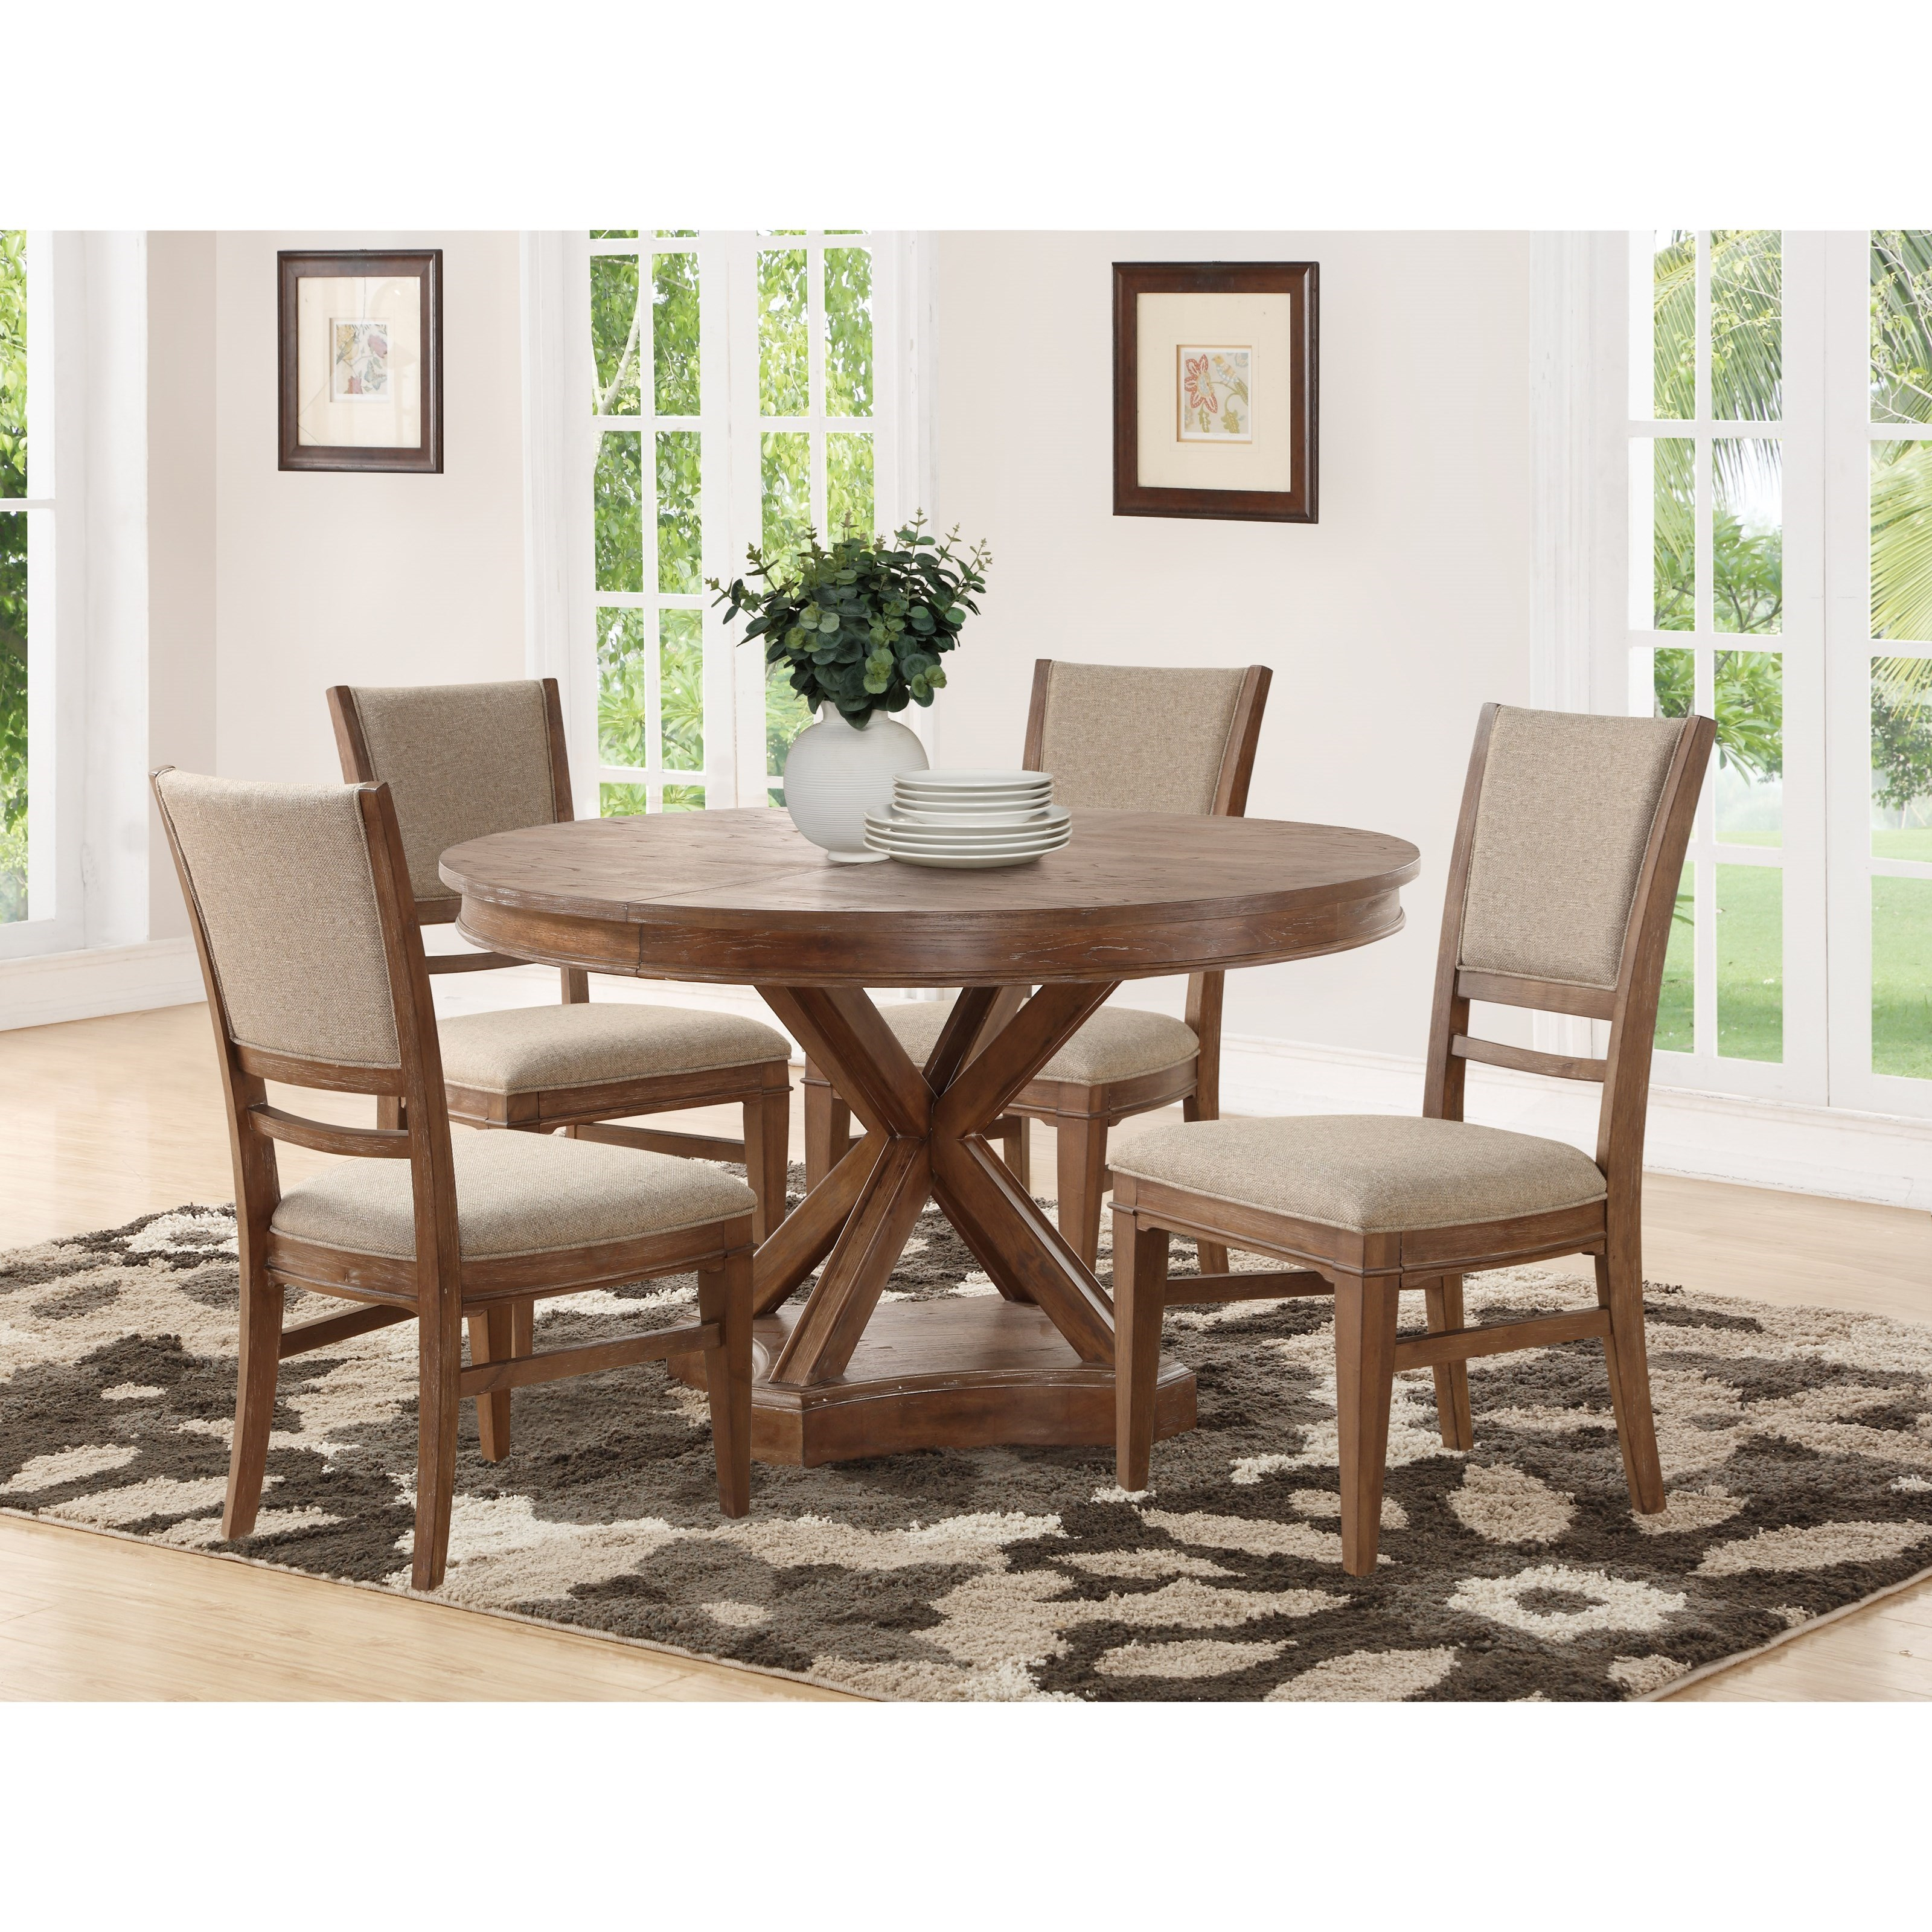 flexsteel wynwood collection hampton dining group rustic 5. Black Bedroom Furniture Sets. Home Design Ideas